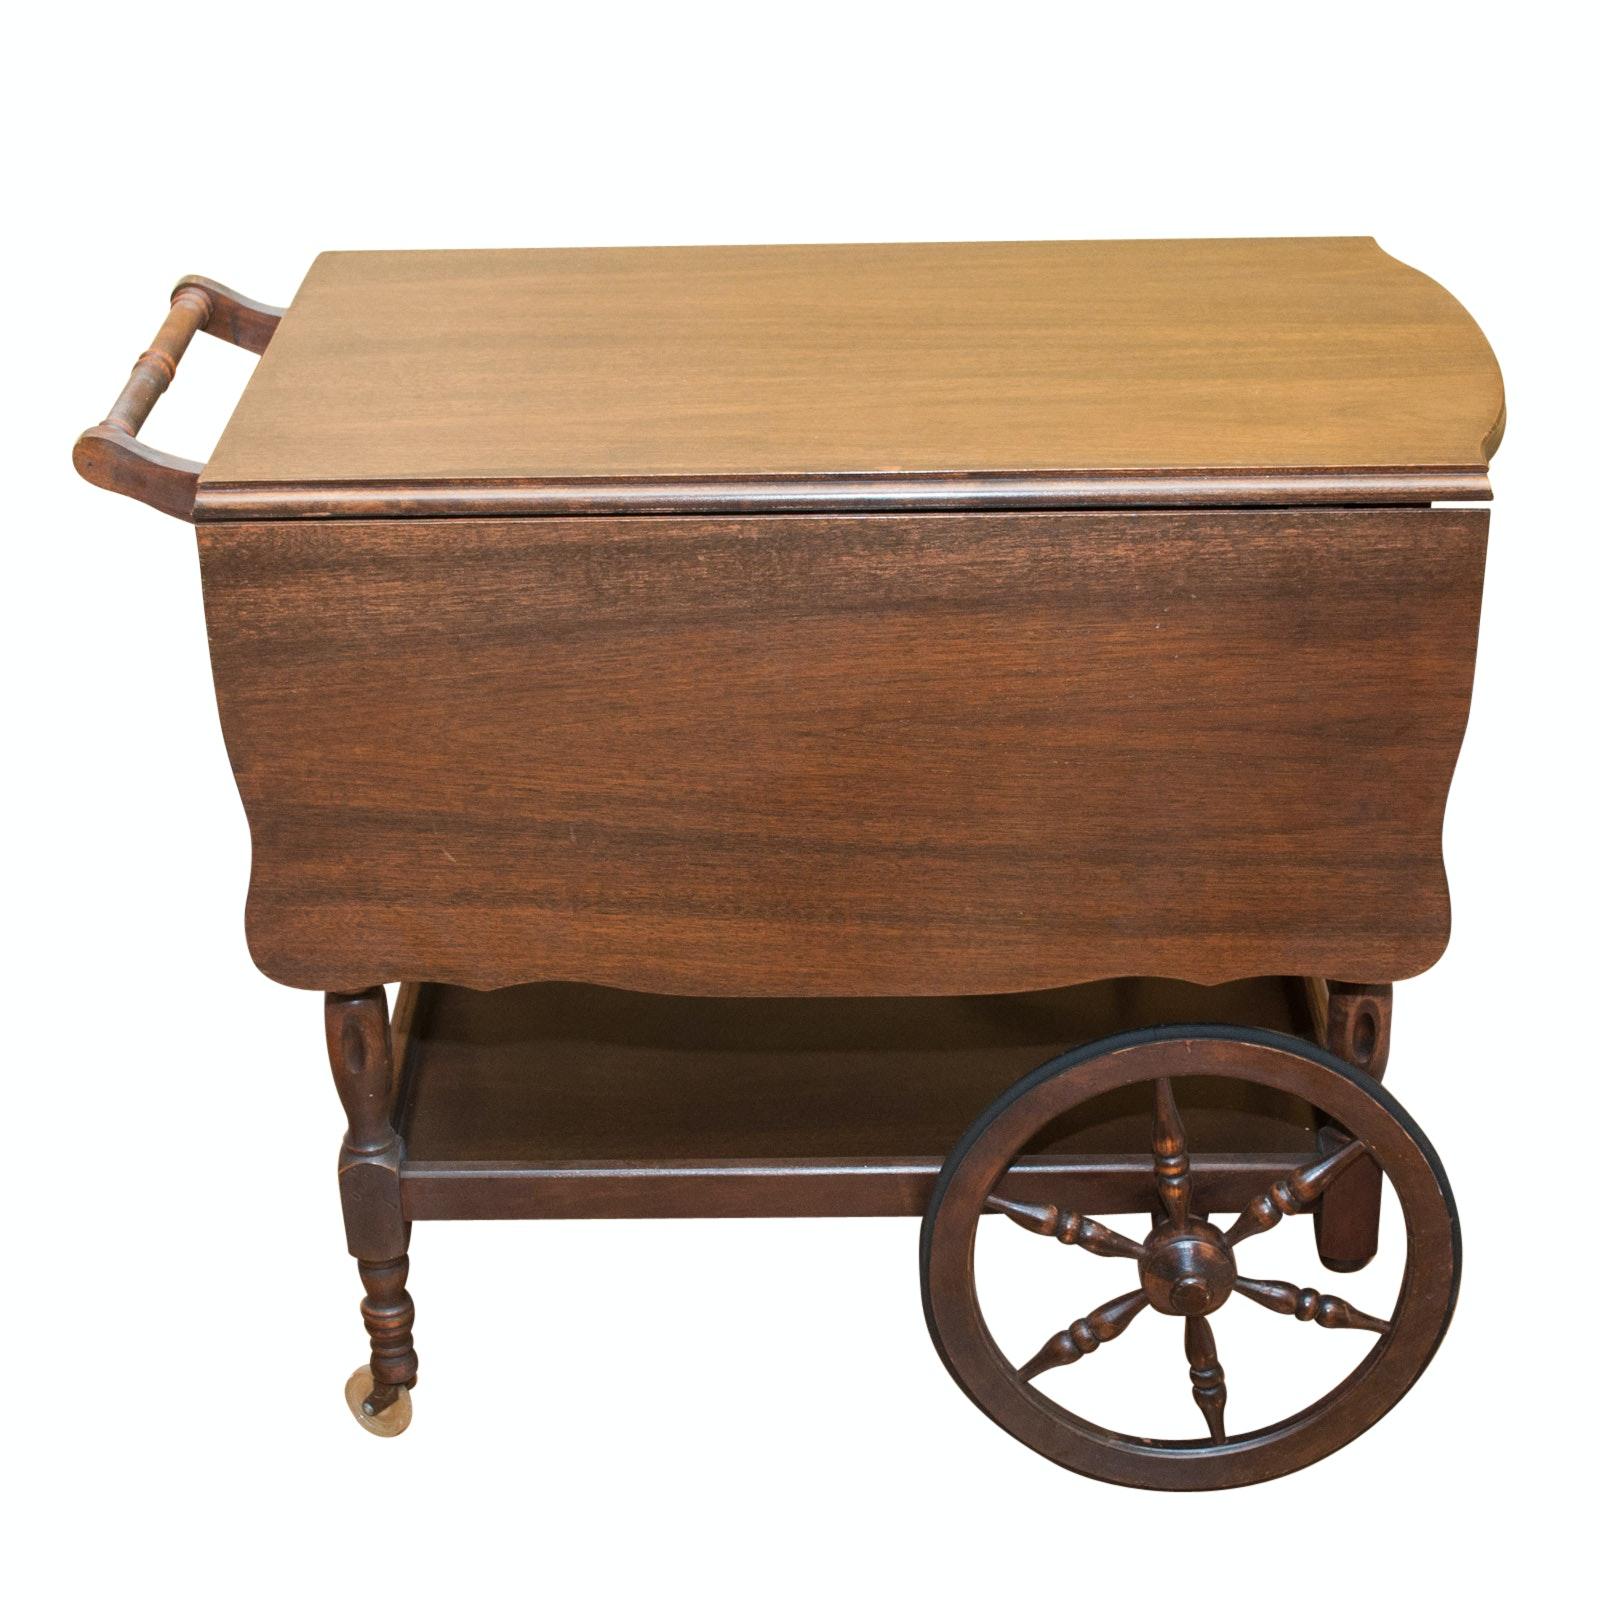 Vintage Drop-Leaf Tea Cart